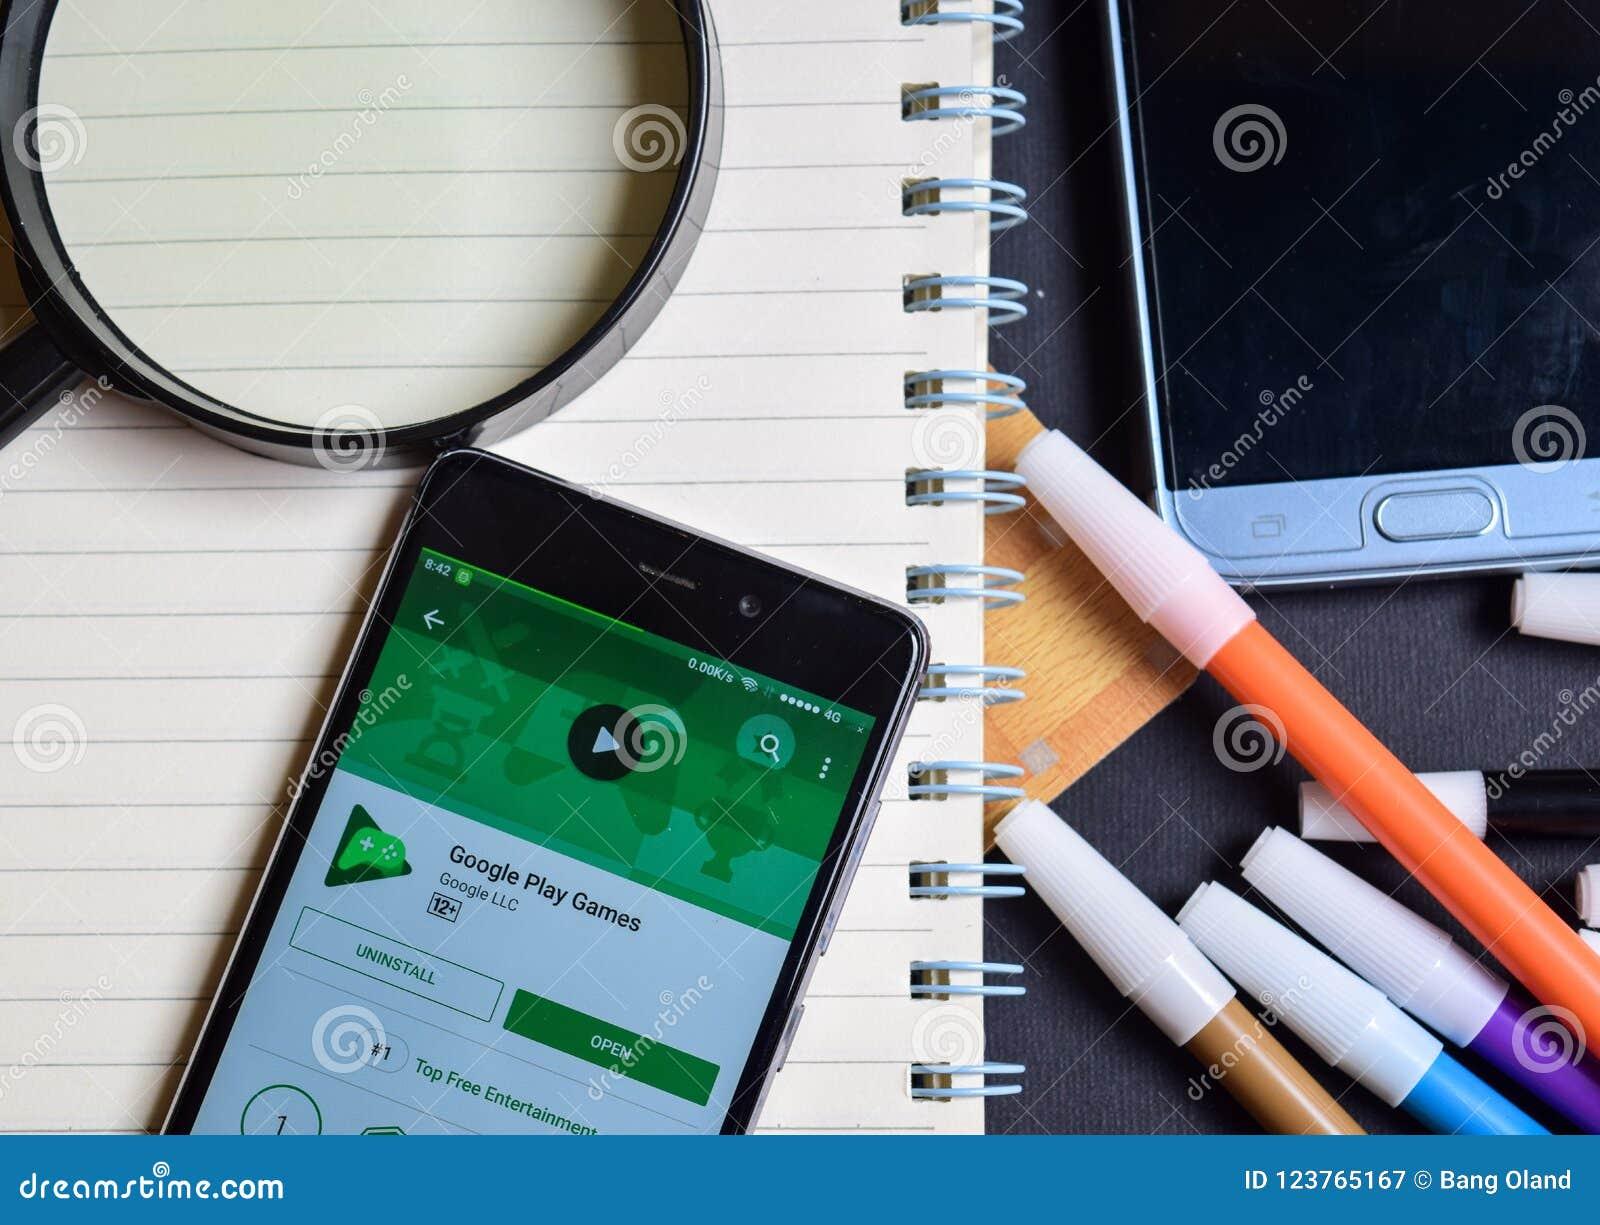 Google Play Games App On Smartphone Screen  Editorial